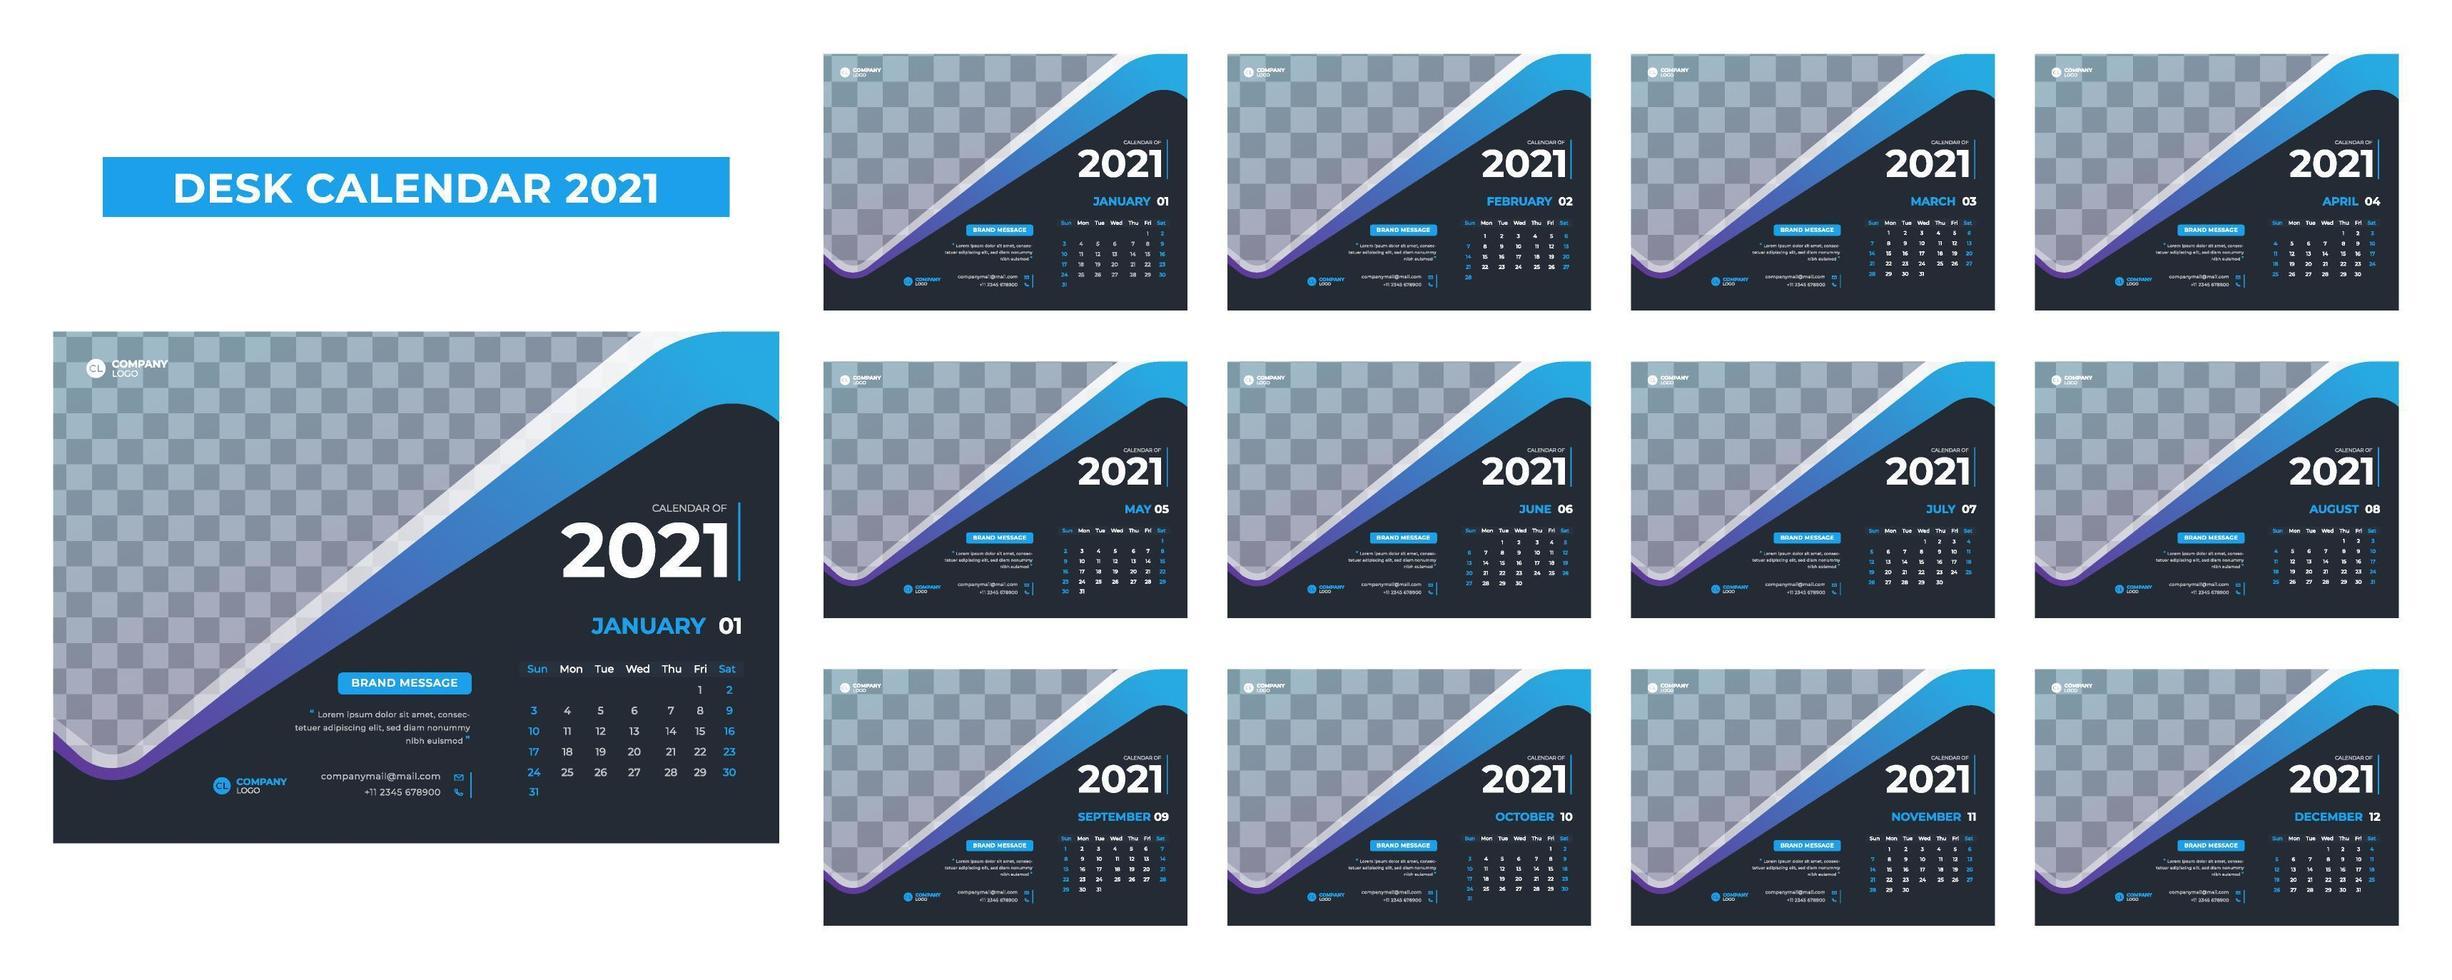 Calendario de escritorio azul y gris para 2021. vector